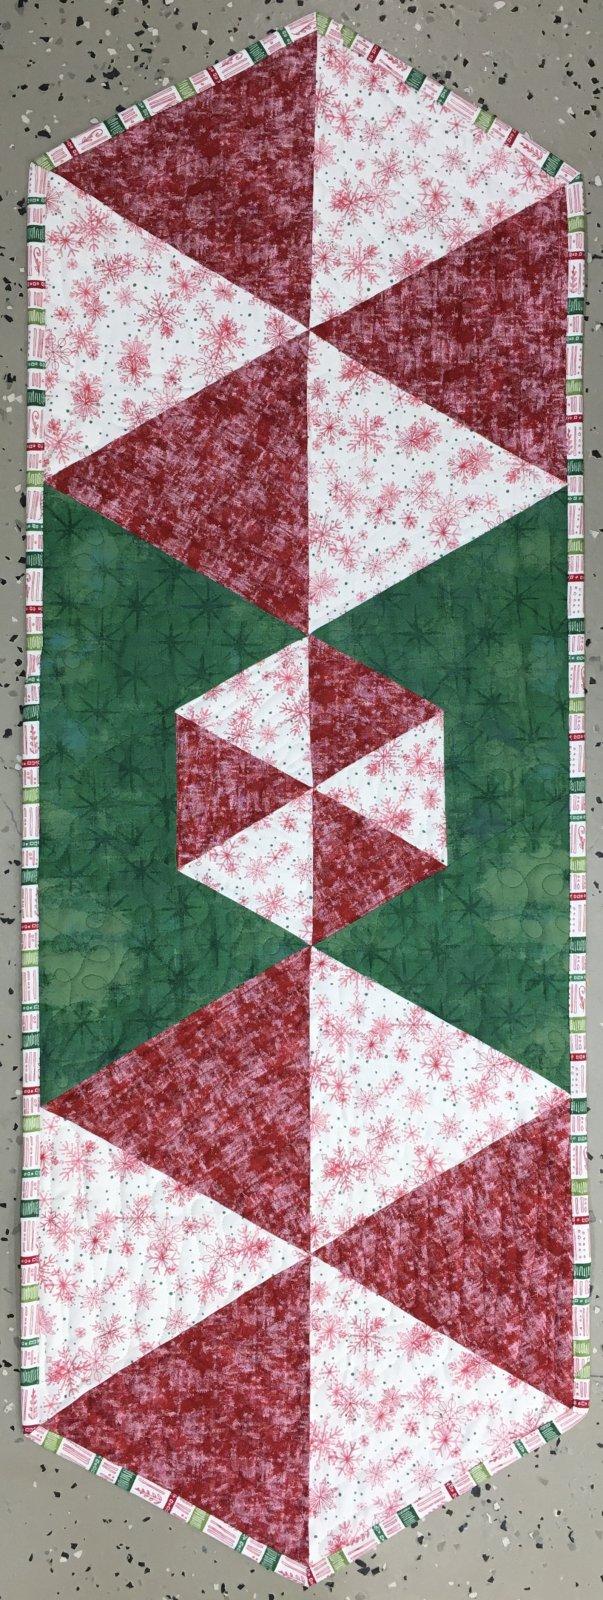 Peppermints Table Runner 15 x 45